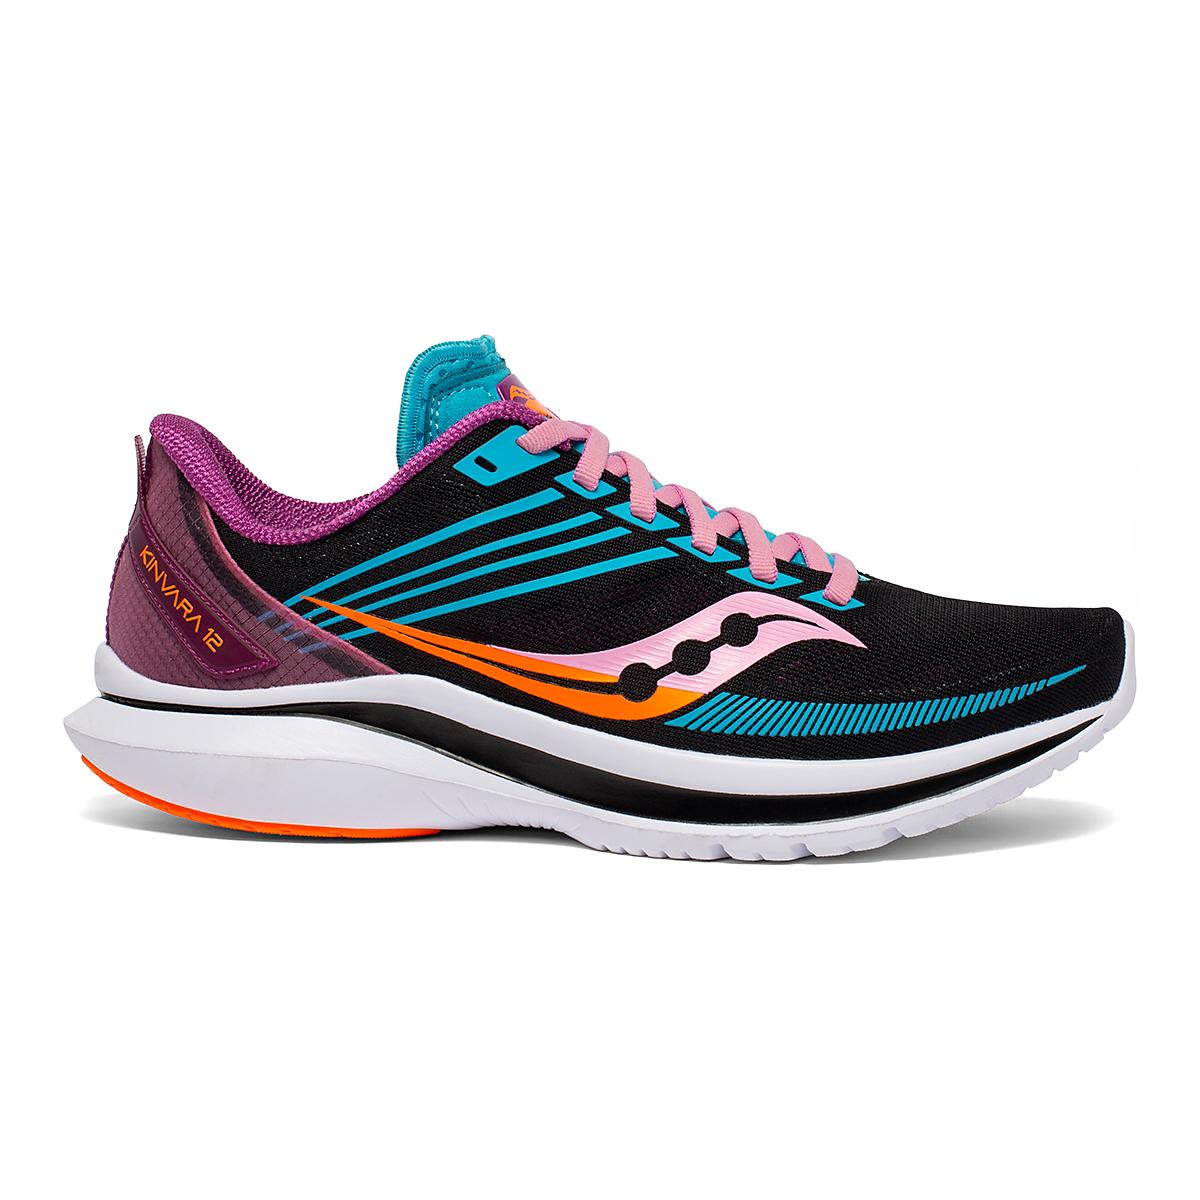 Women's Saucony Kinvara 12 Running Shoe - Color: Future/Black - Size: 5 - Width: Regular, Future/Black, large, image 1